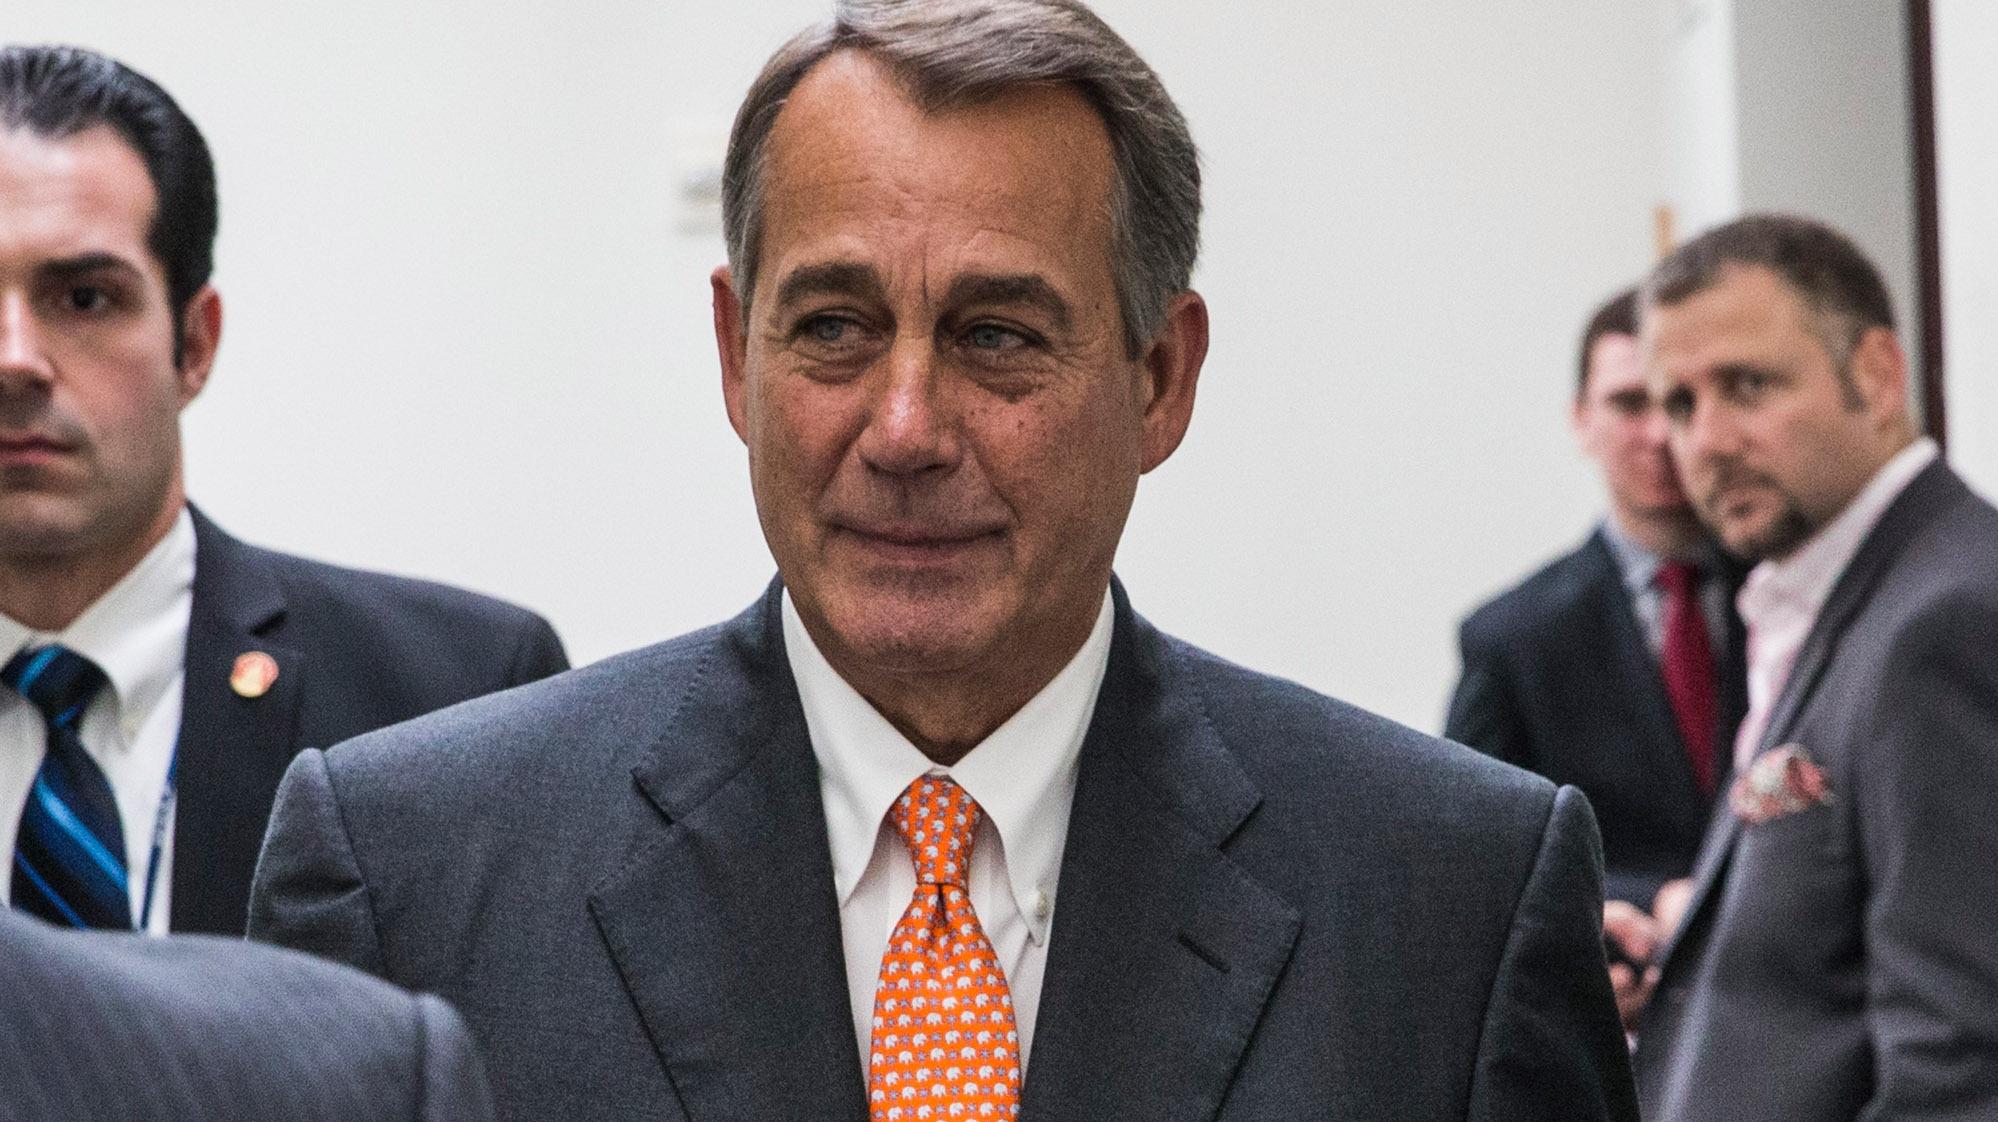 Senate Democrats Visit Obama; Boehner Says Talks Are Over